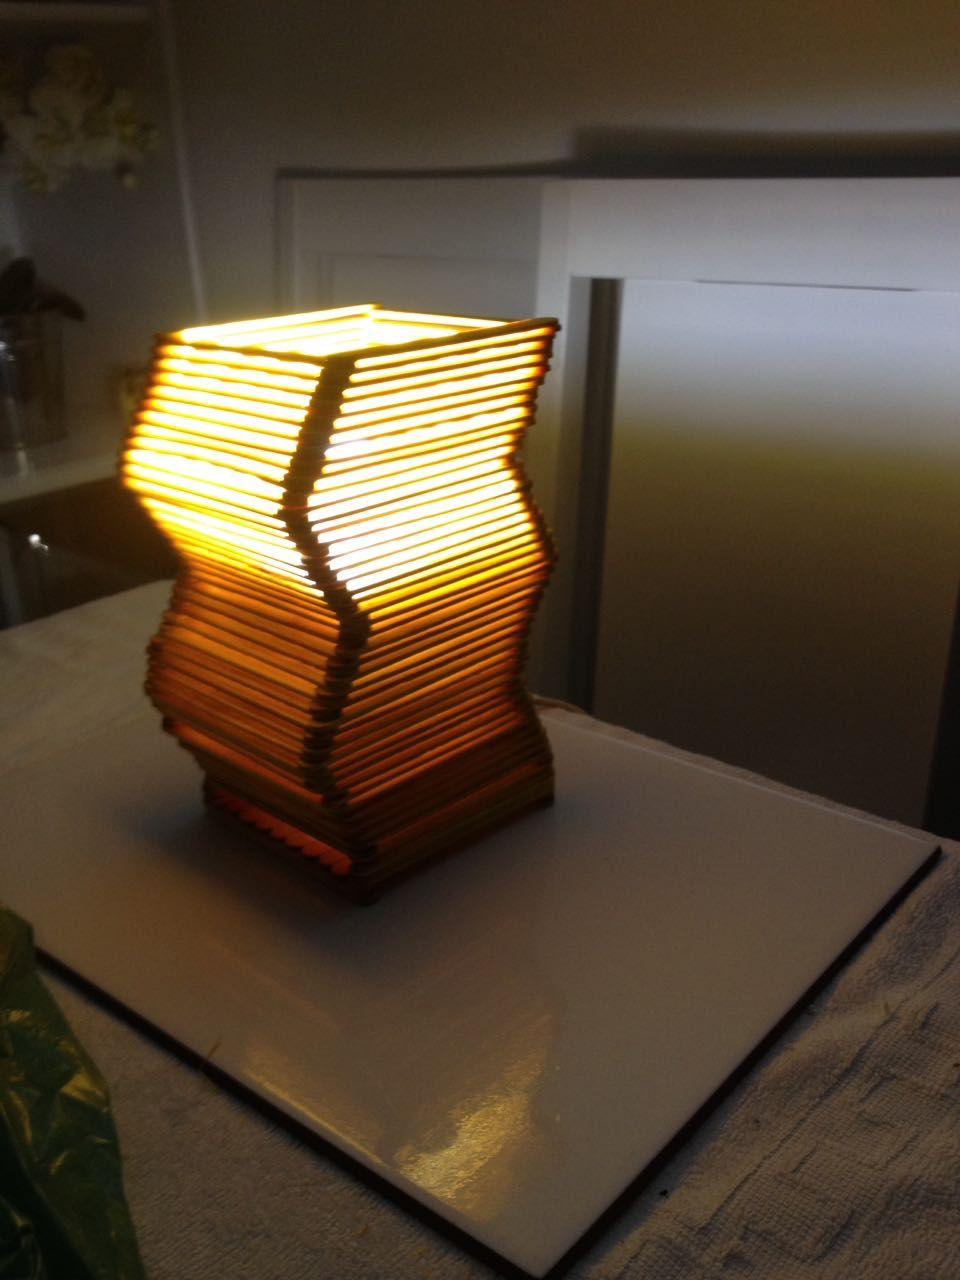 Luminaria De Palito De Picole Palito De Picole Palitos E Artesanato